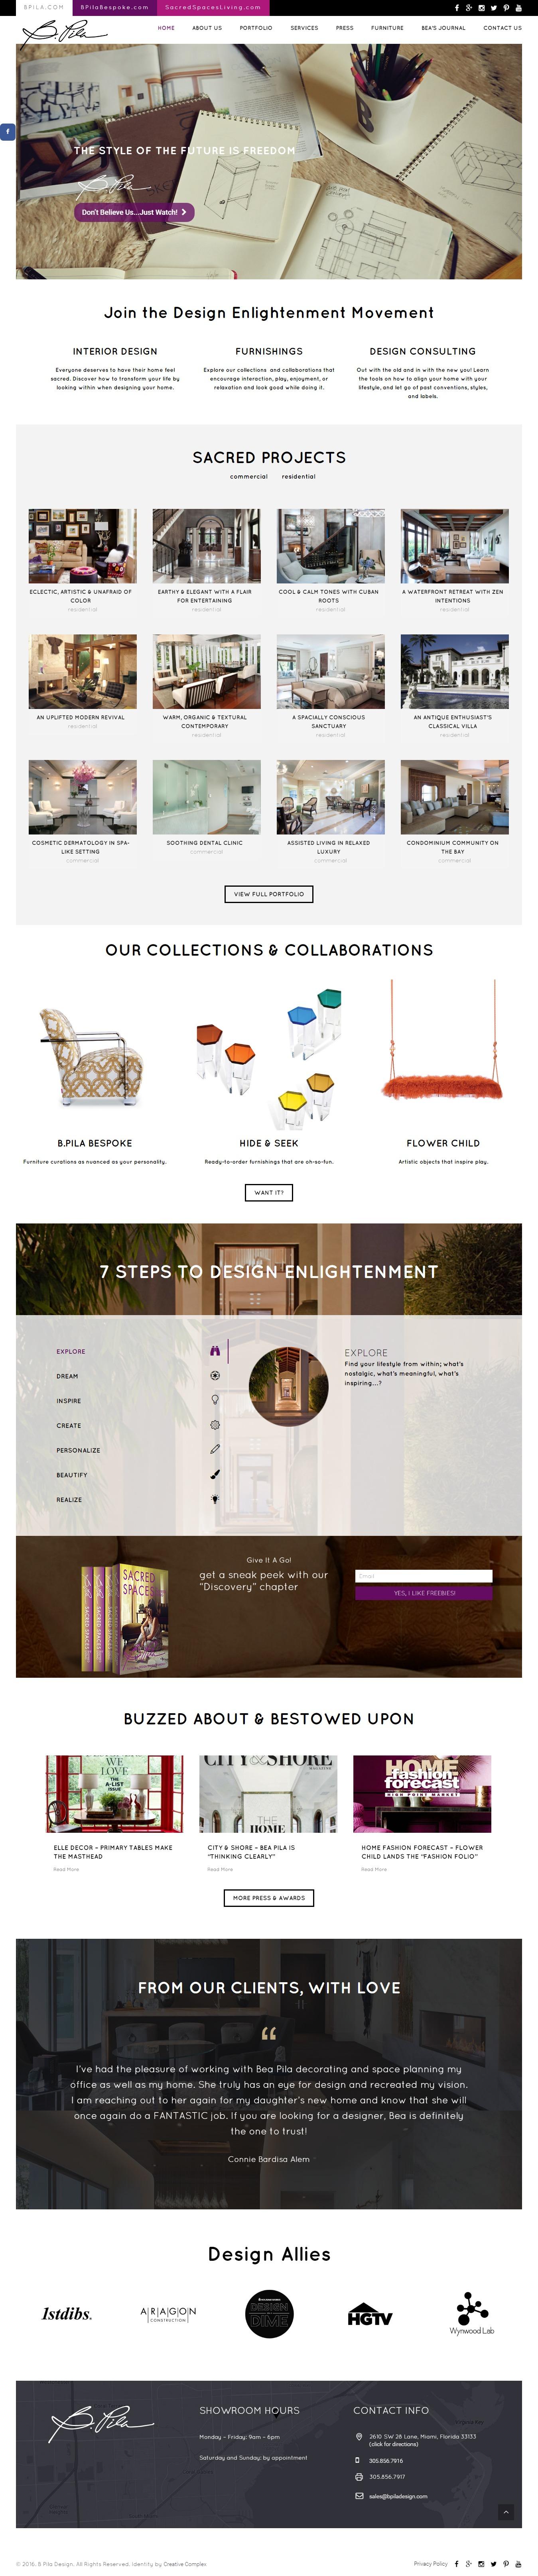 home-bpiladesign